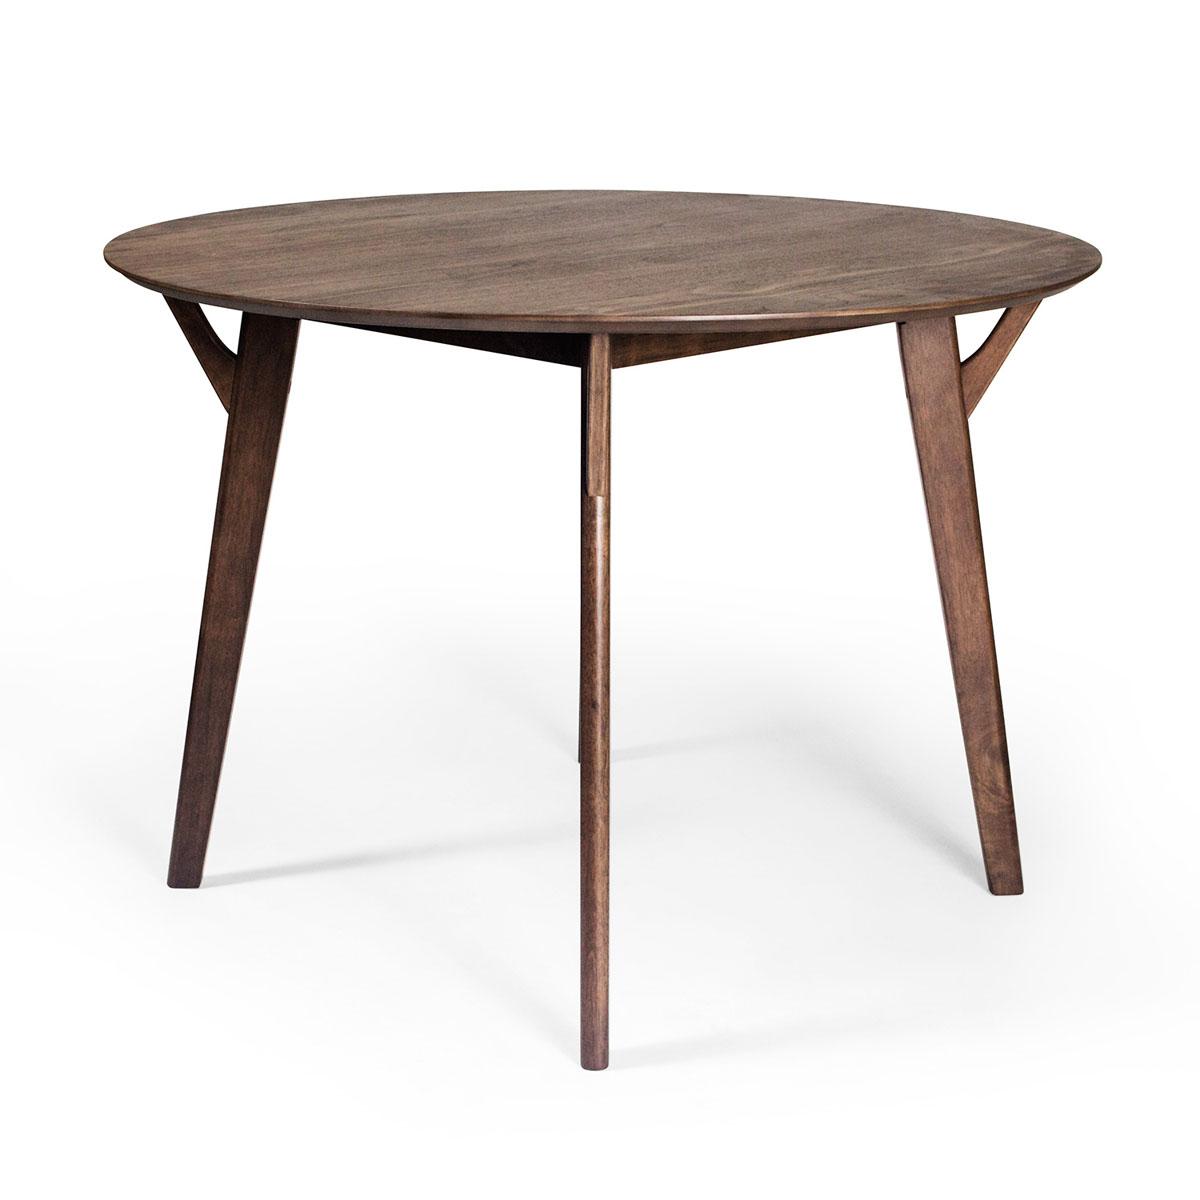 Scandi Round Dining Table. U003e